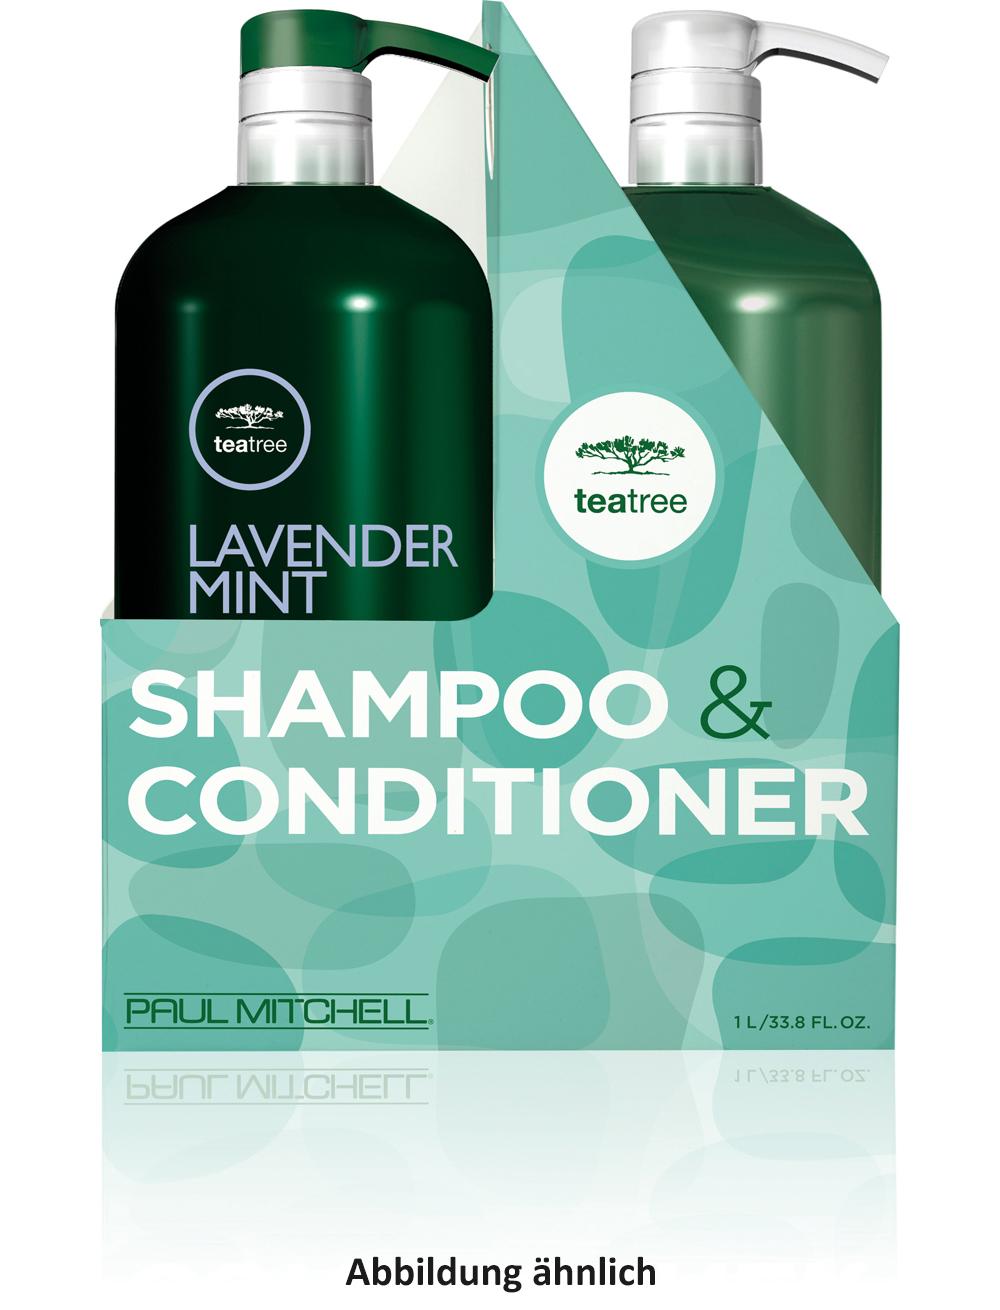 Paul Mitchell Duo Tea Tree Lavender Mint Set Shampoo und Conditioner je 1L + 2 Pumpen